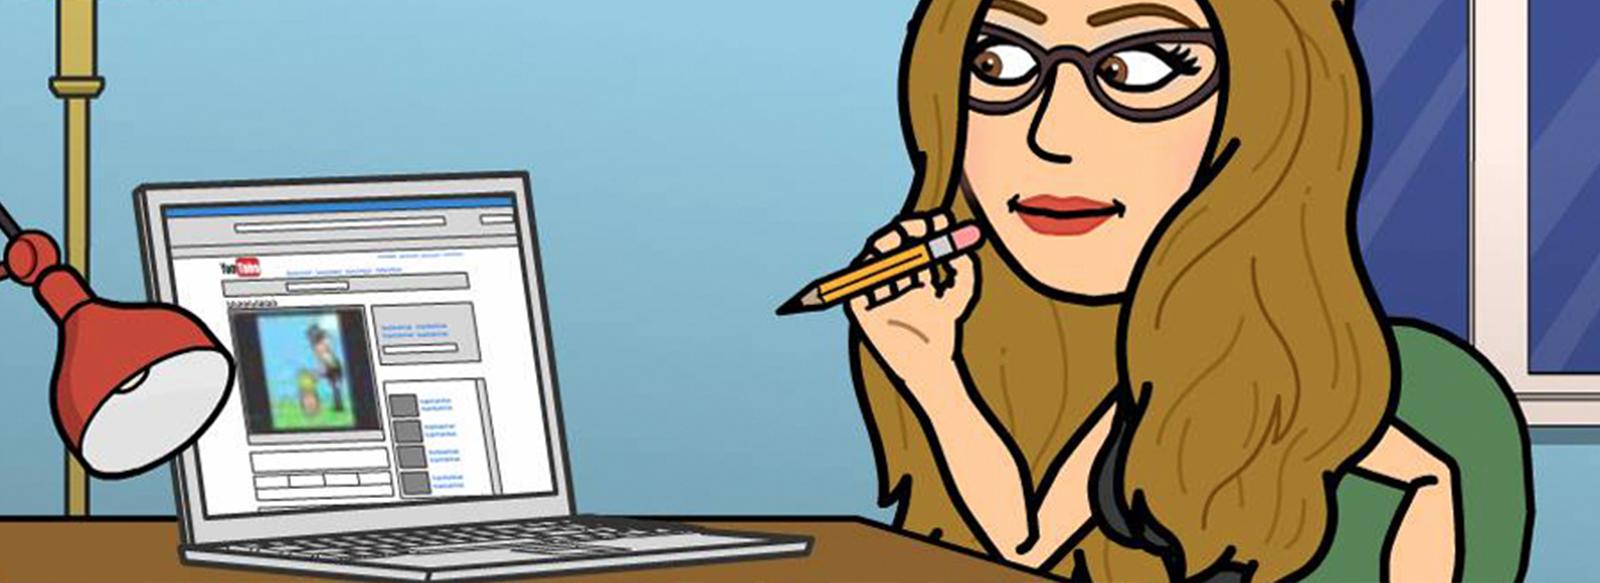 Edith suit des MOOCs